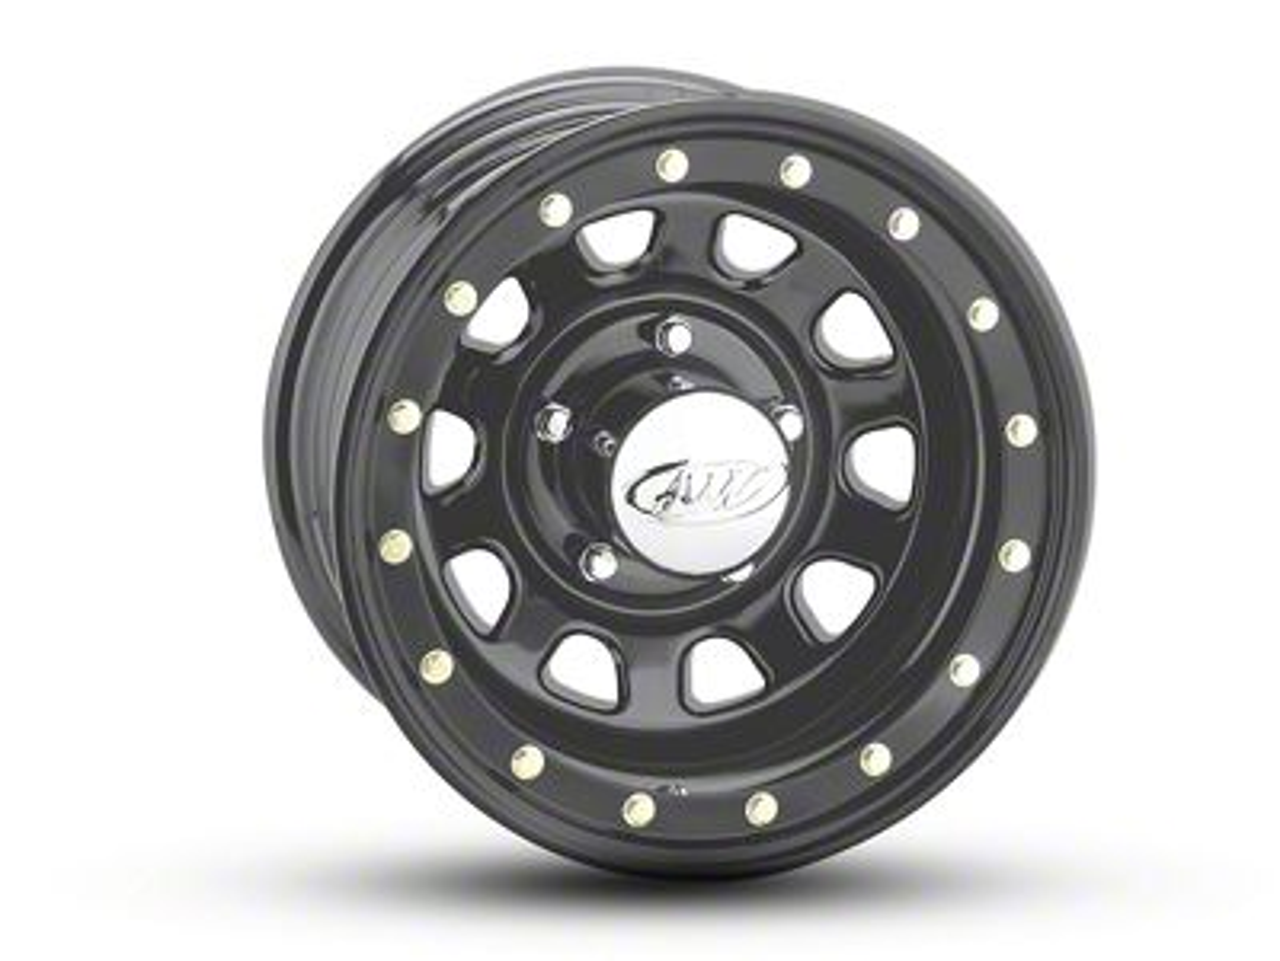 Raceline 54M Daytona Matte Black Wheel - 16x8 (07-18 Jeep Wrangler JK)